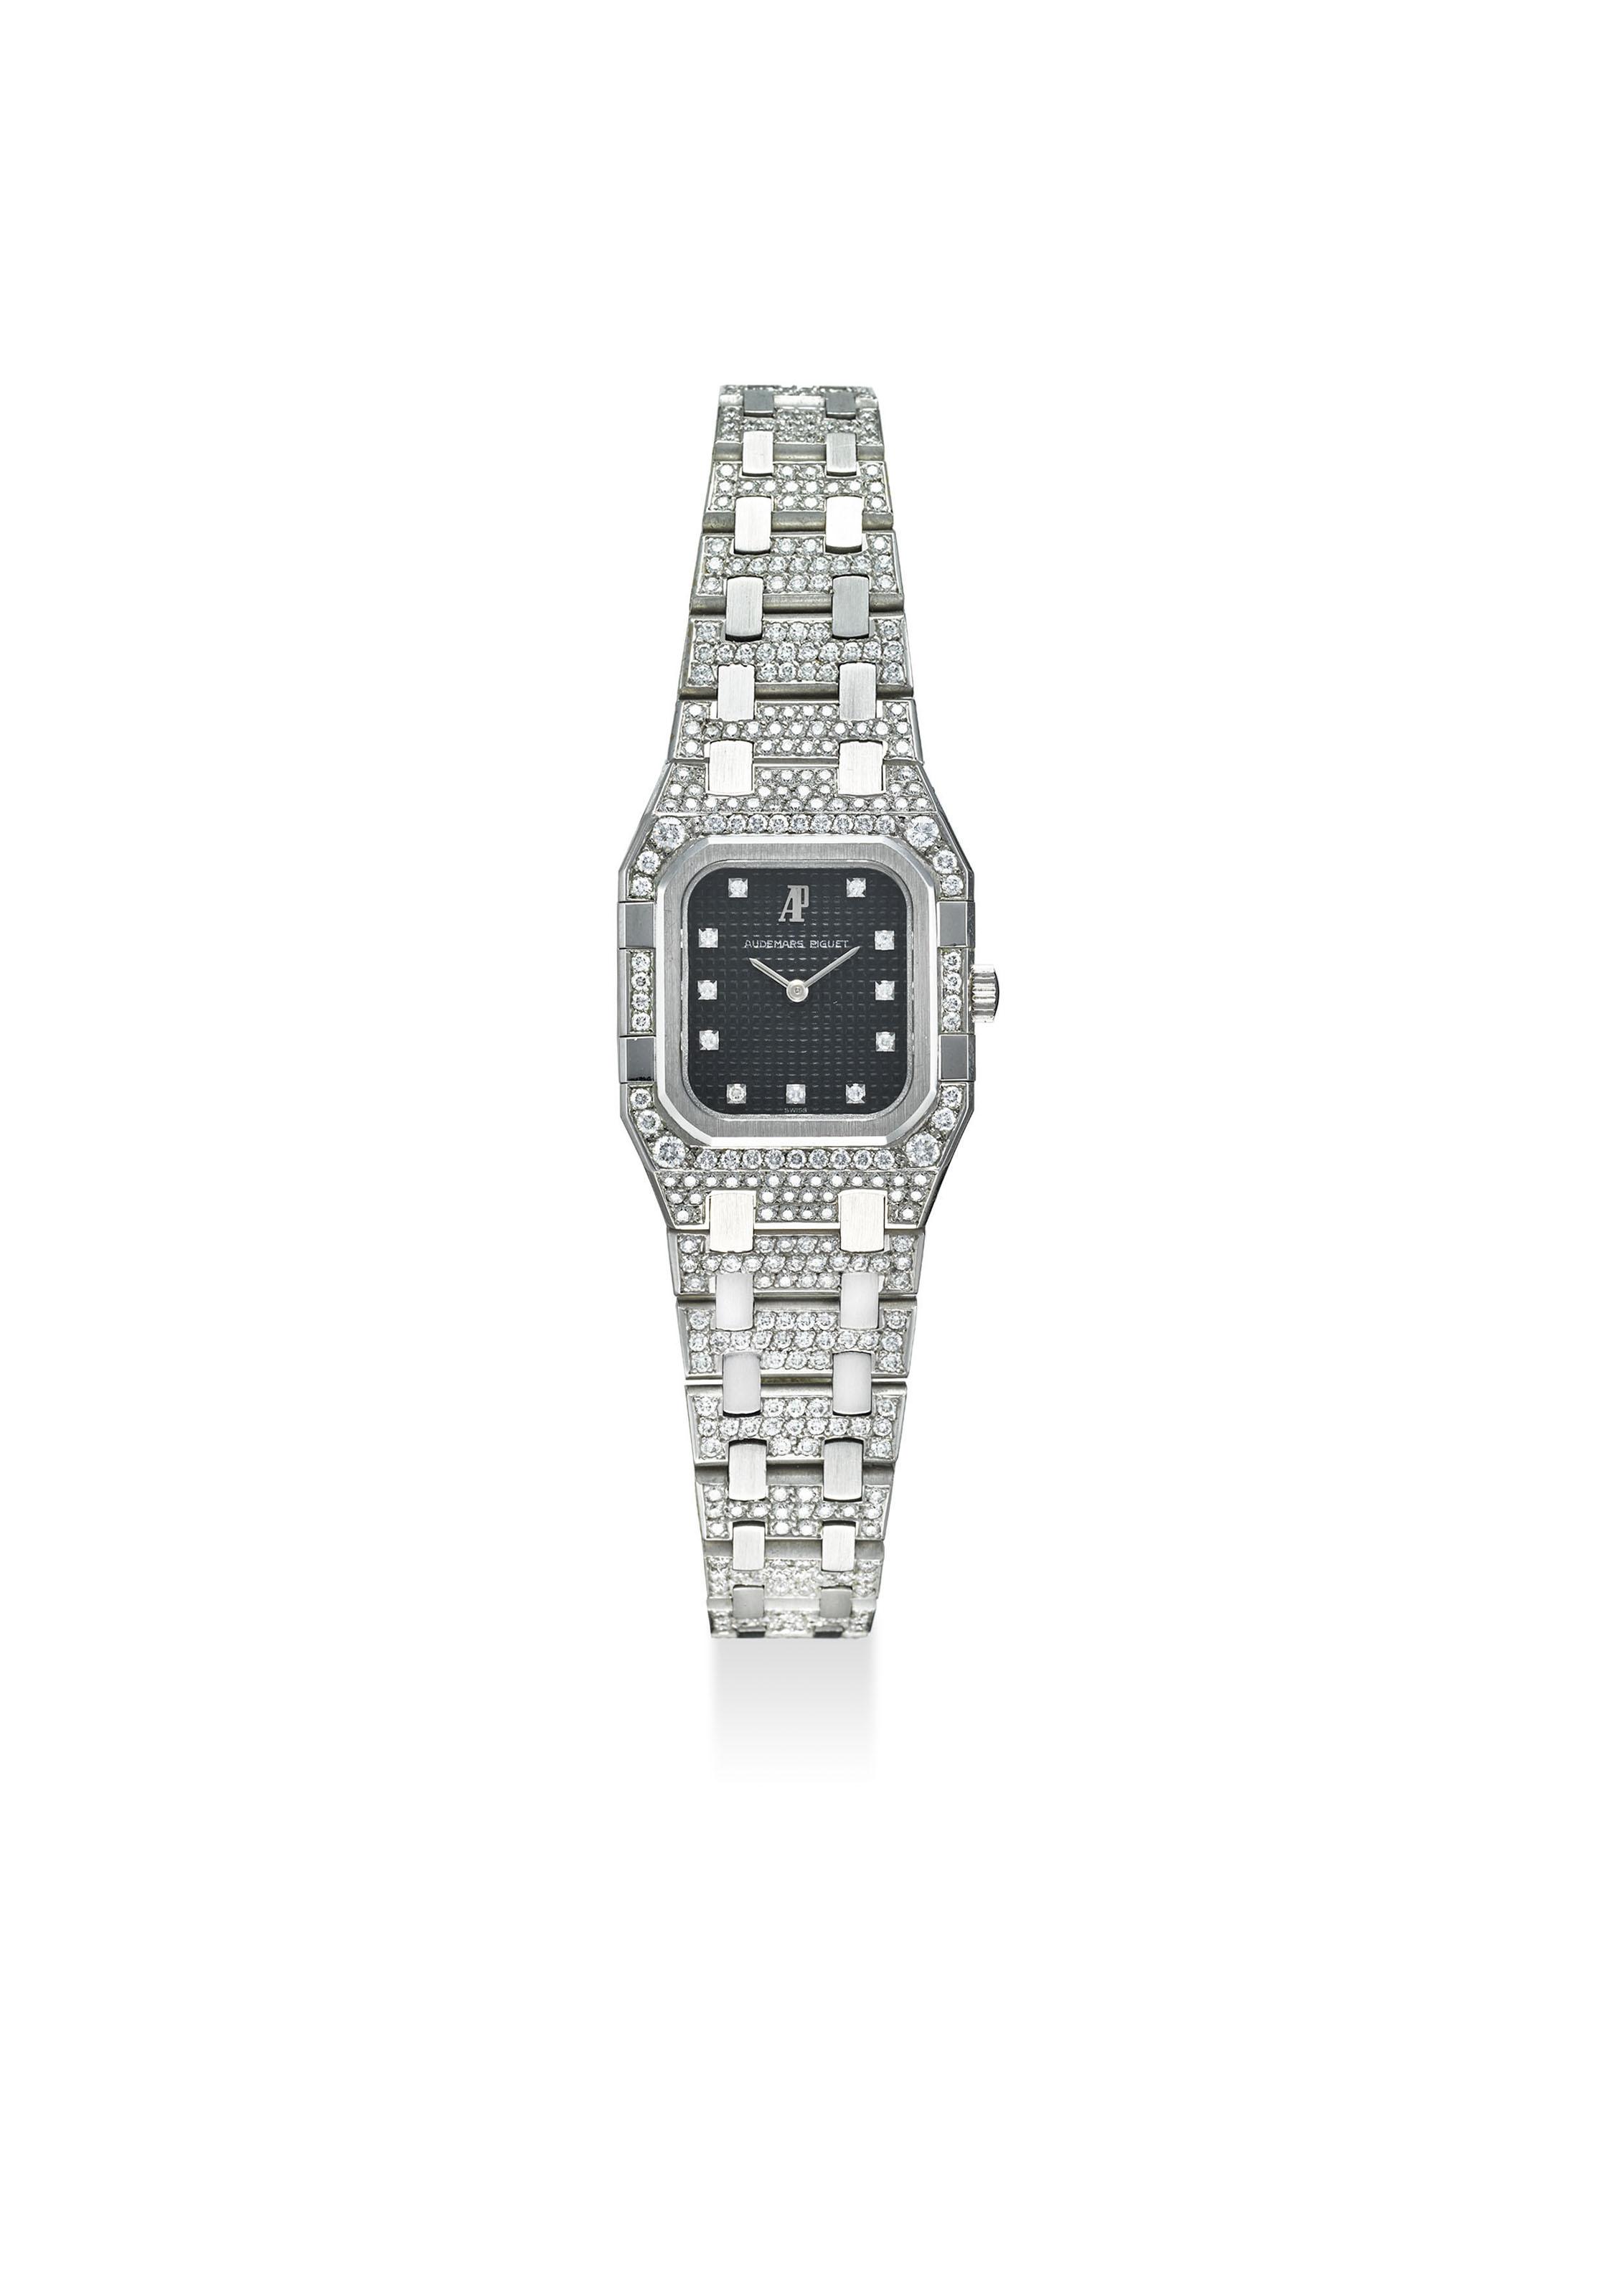 Audemars piguet an 18k white gold and diamond set octagonal quartz wristwatch with bracelet for Audemars piguet kinetic